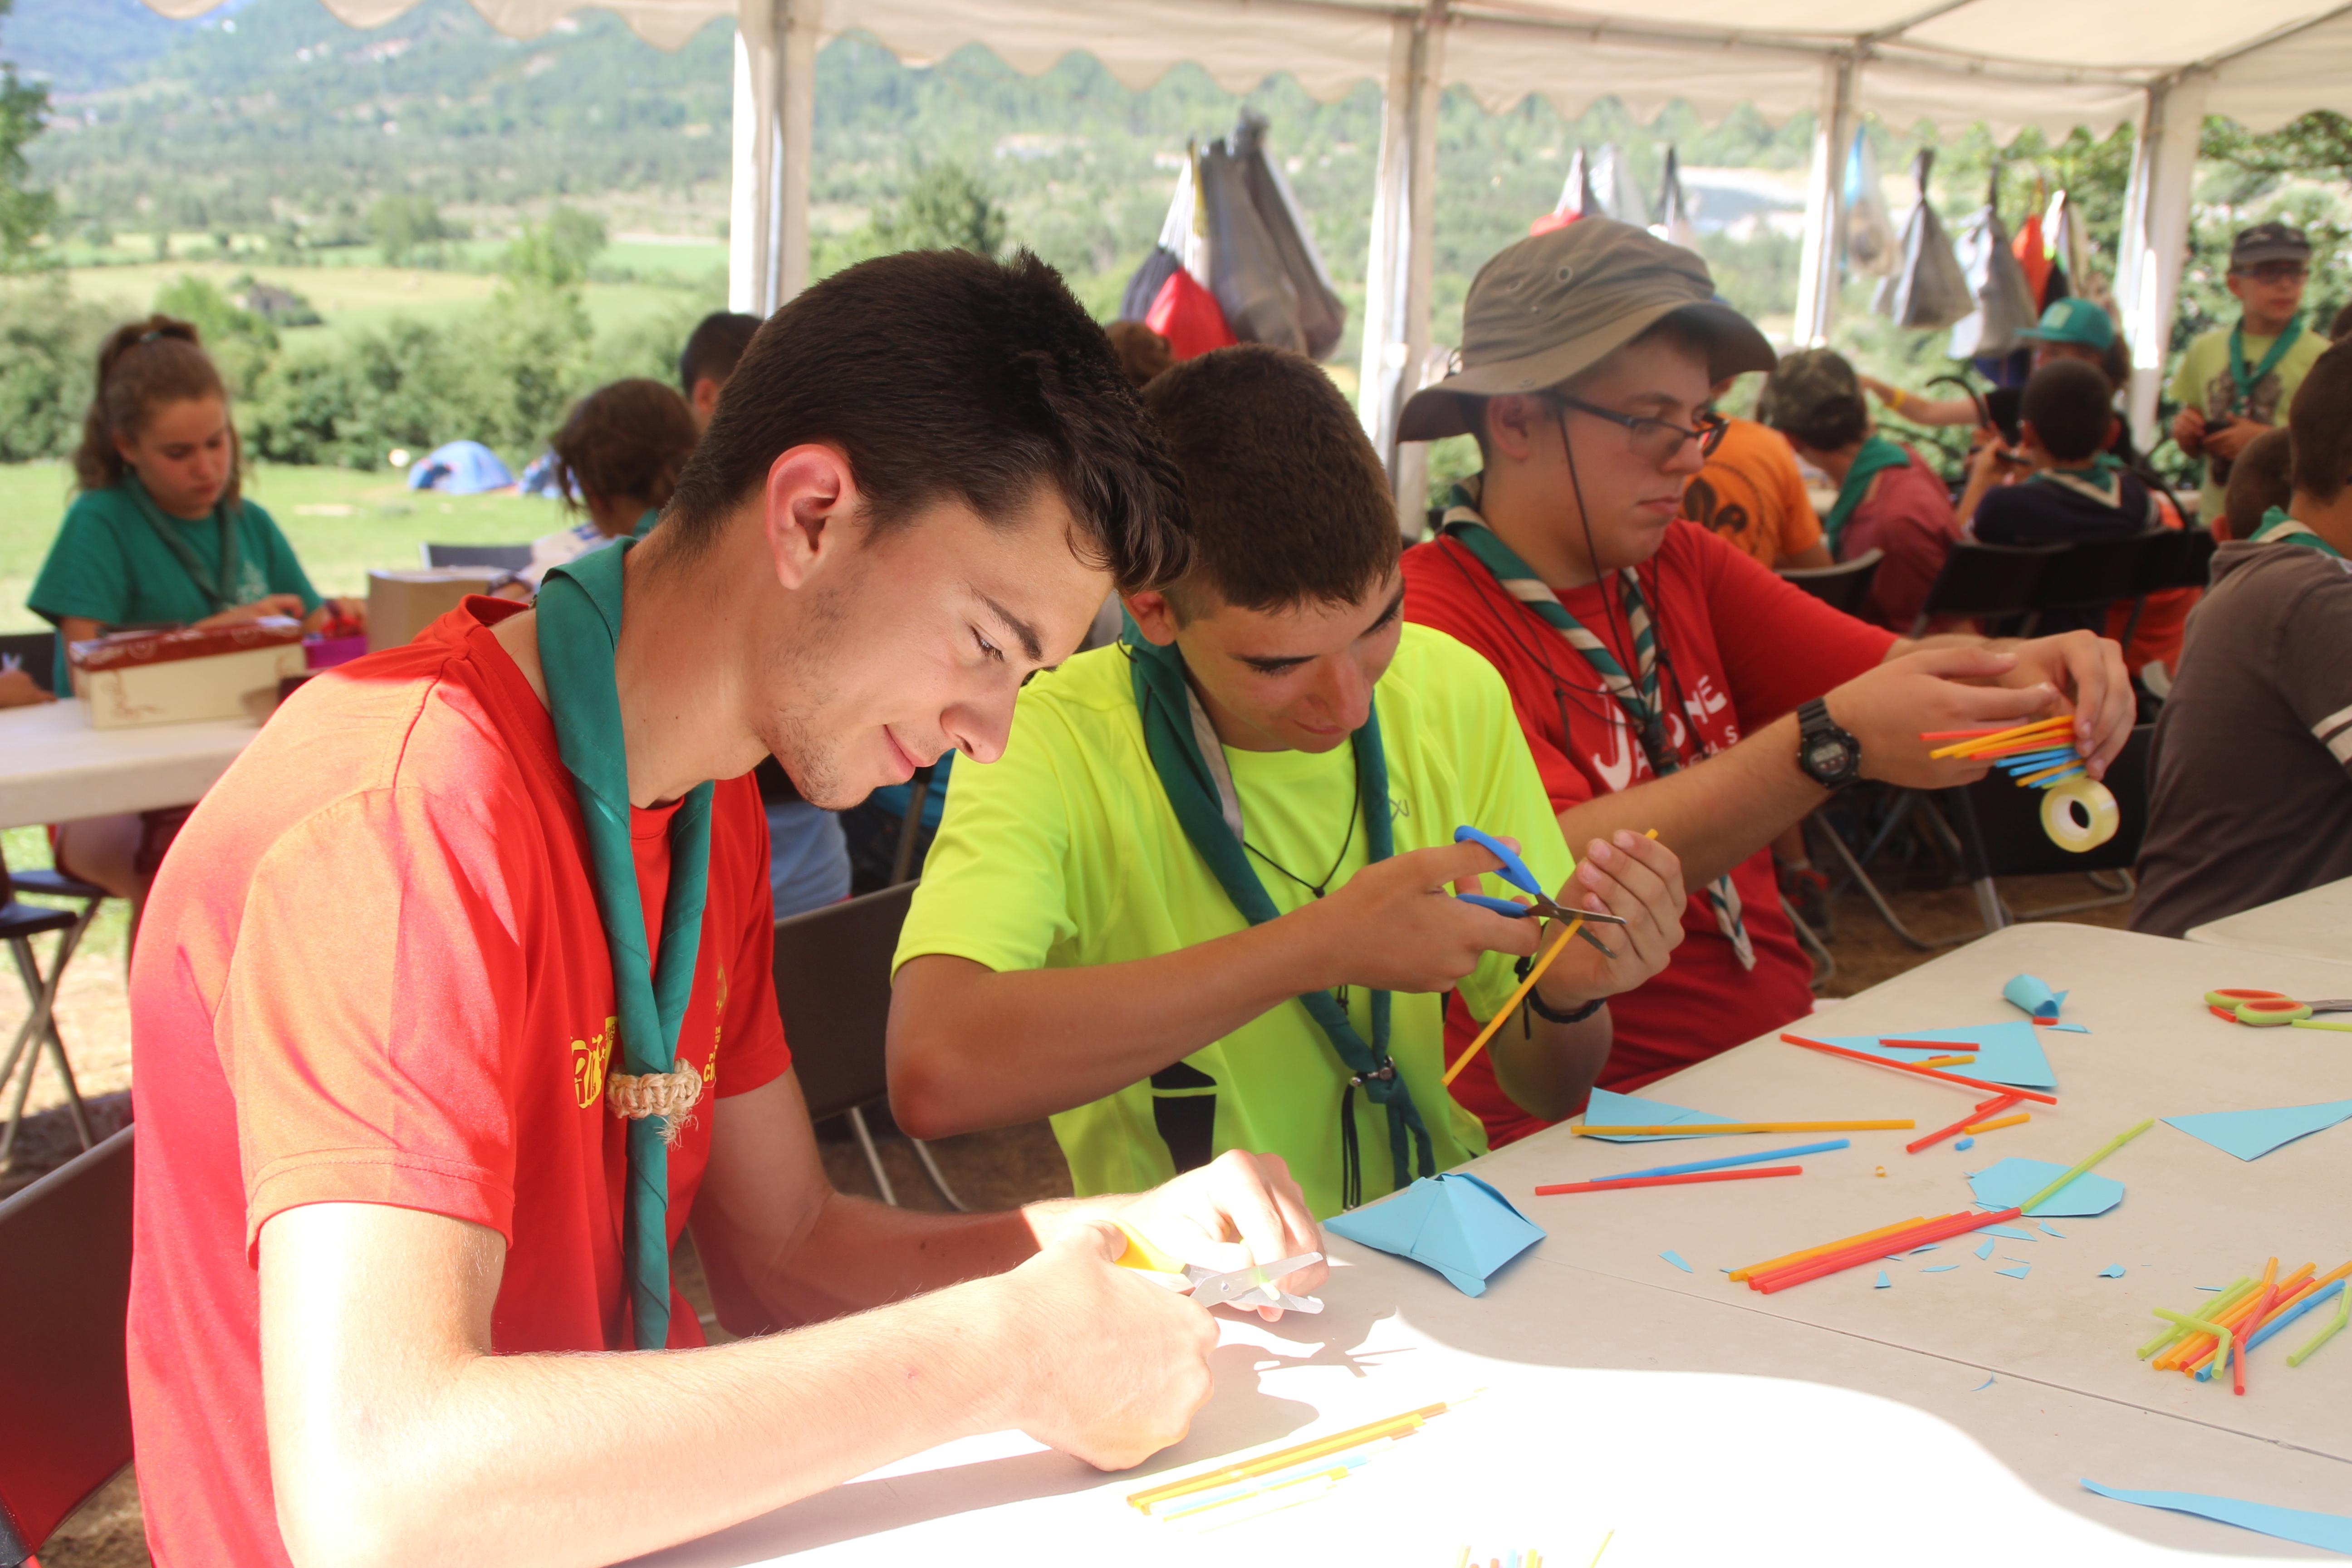 15-16 - Grupo - Campamento de verano - P27